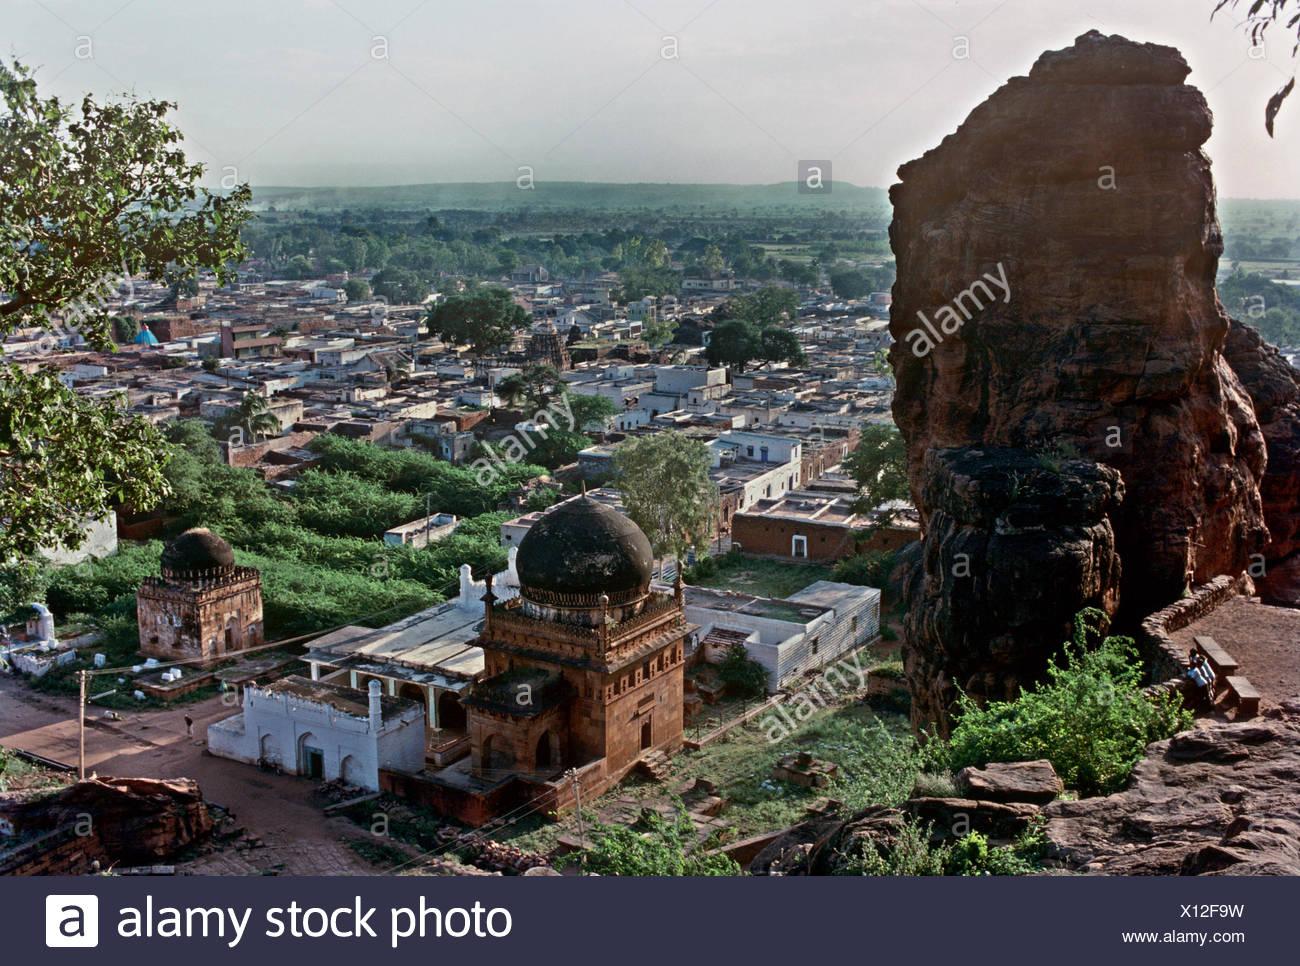 Tipu Sultan's treasury Stock Photo: 276036485 - Alamy